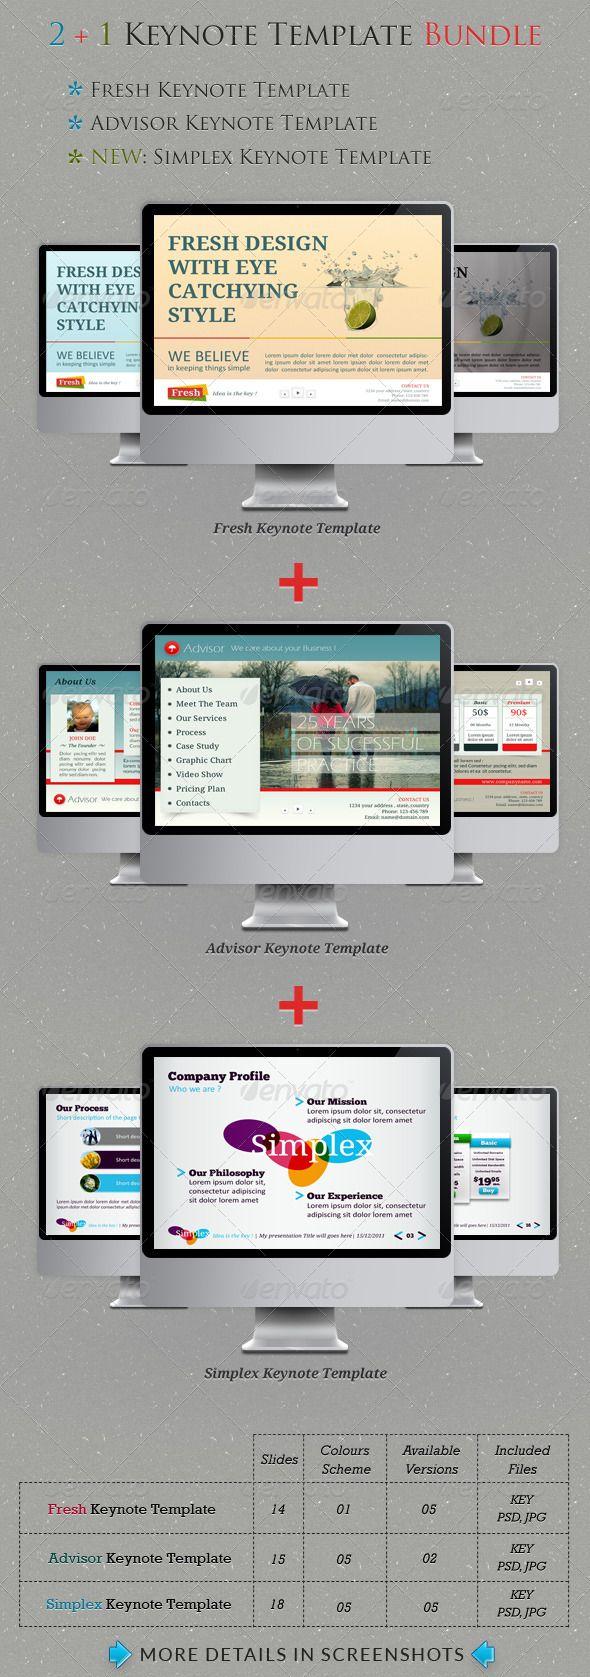 22 best Keynote Presentation images on Pinterest | Keynote template ...